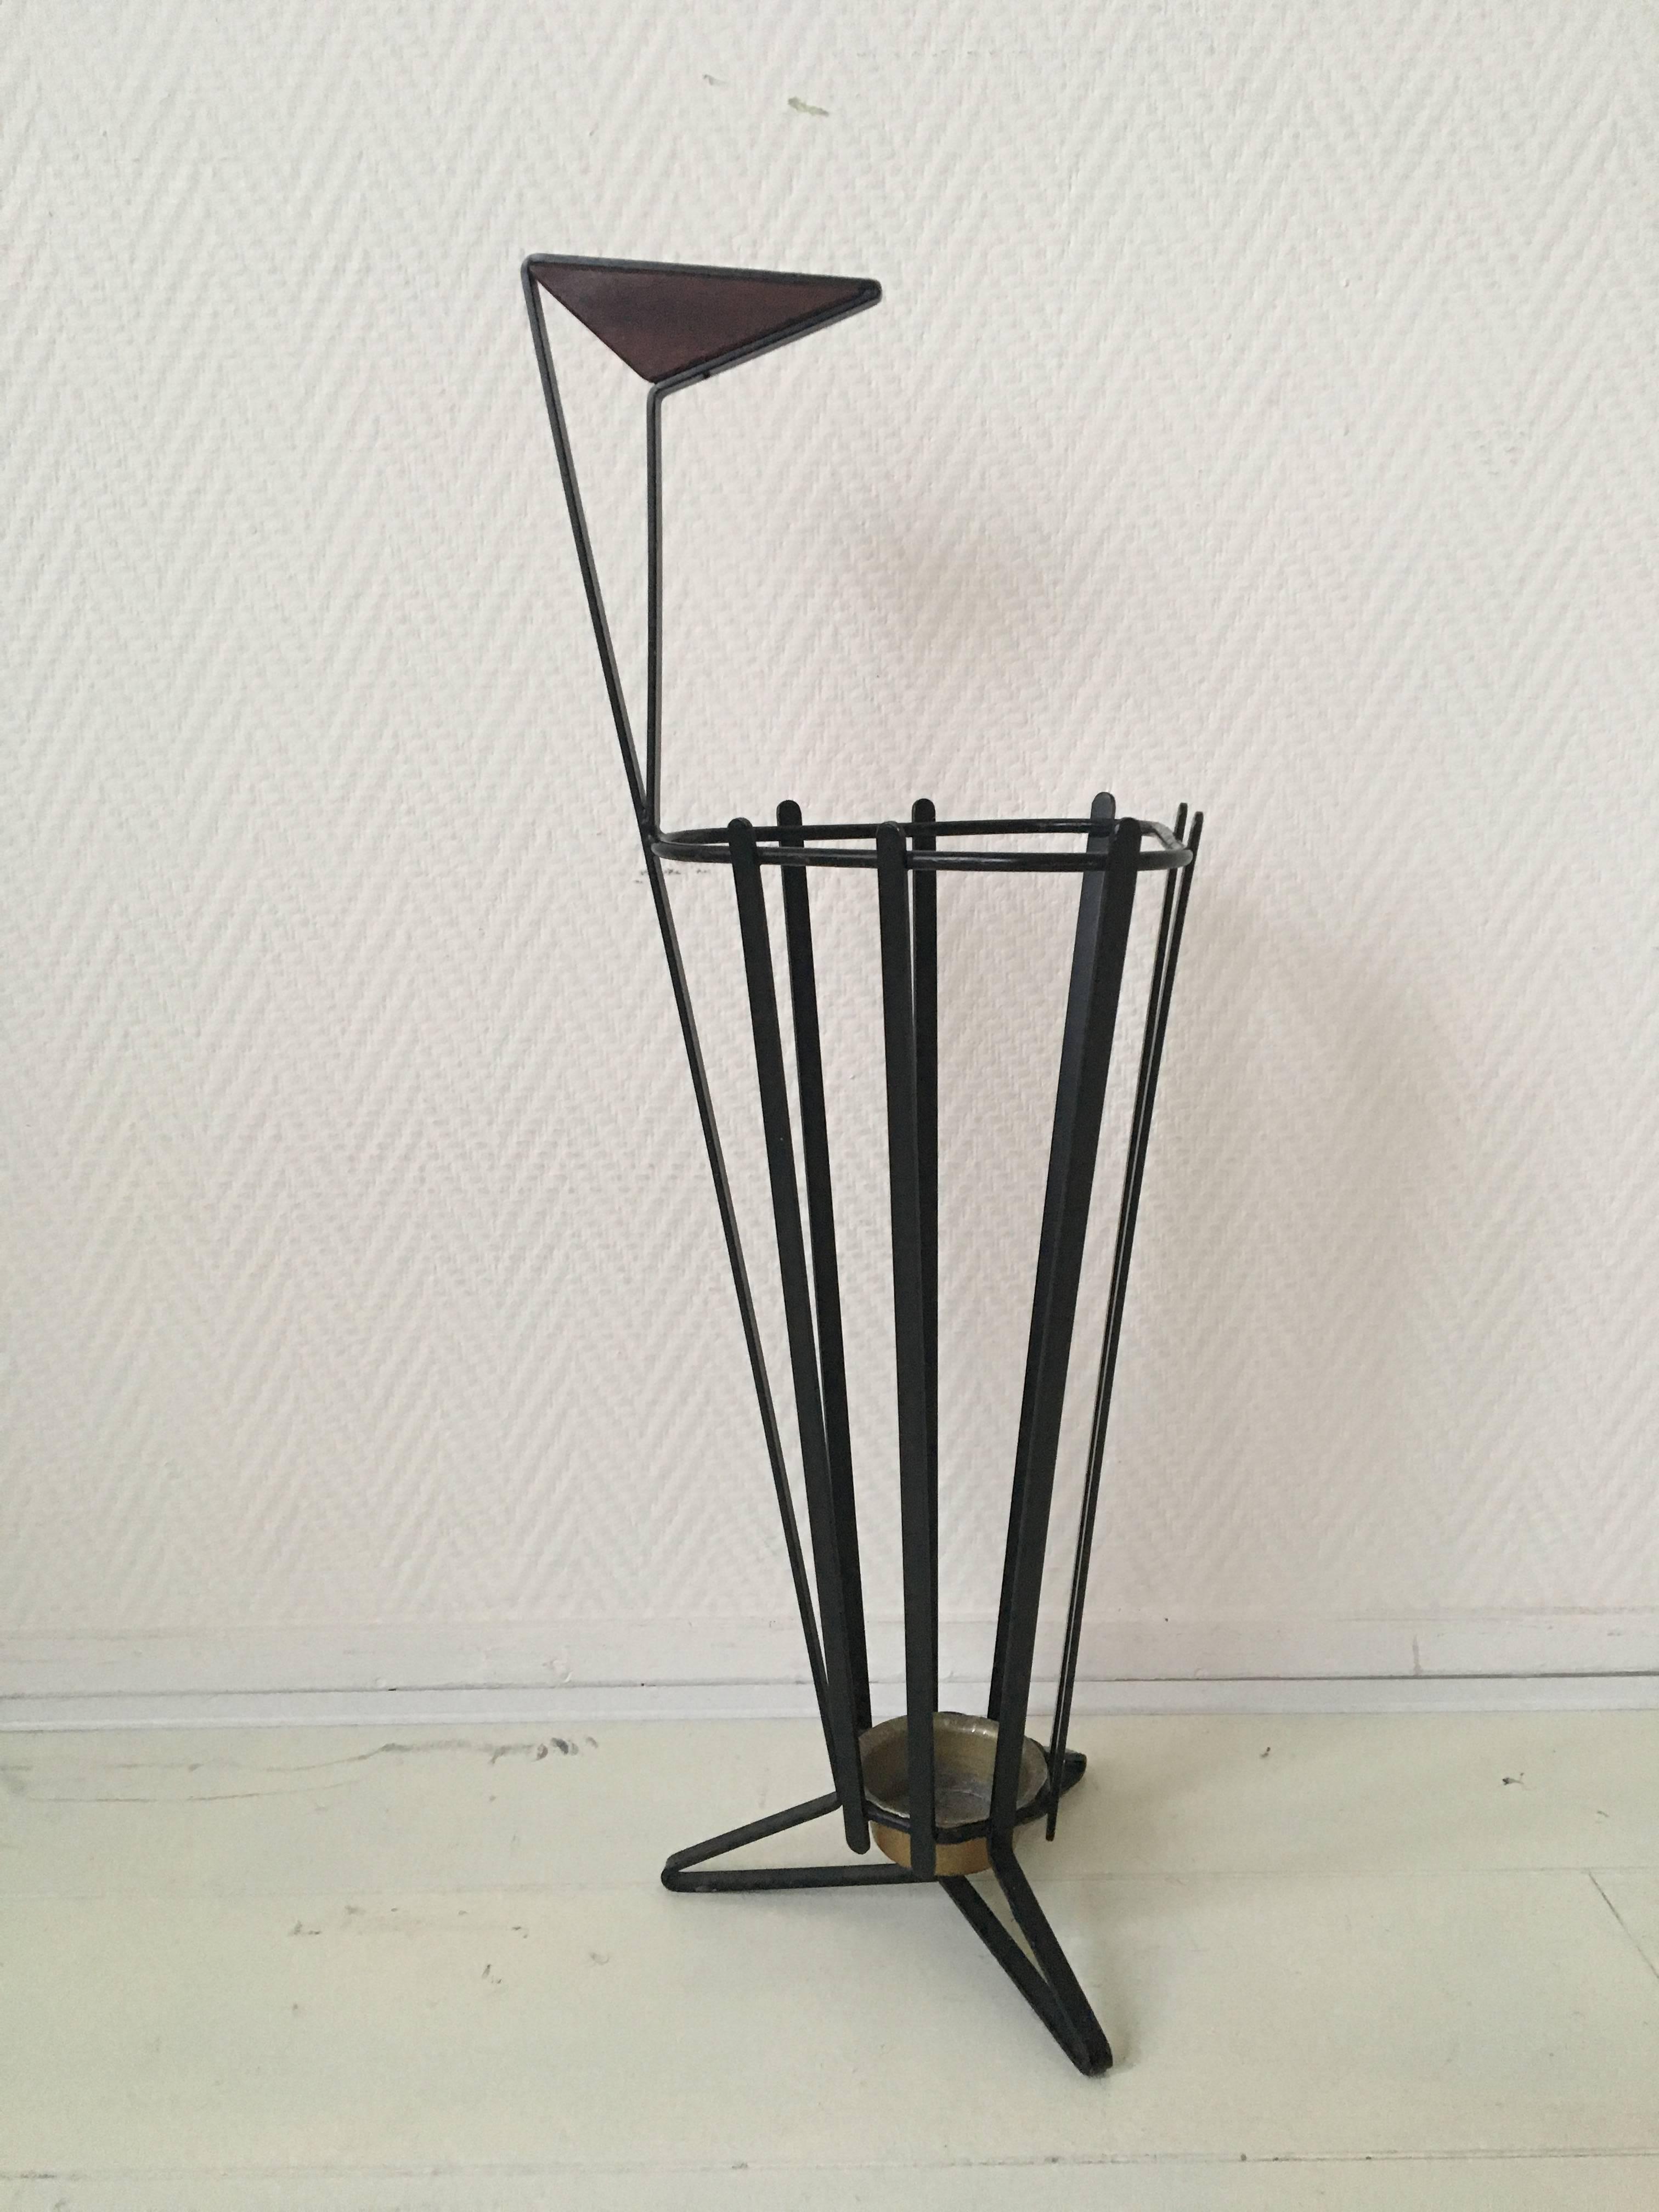 Umbrella Stand Designs : Metal and teak tripod umbrella stand in style of mathieu matégot